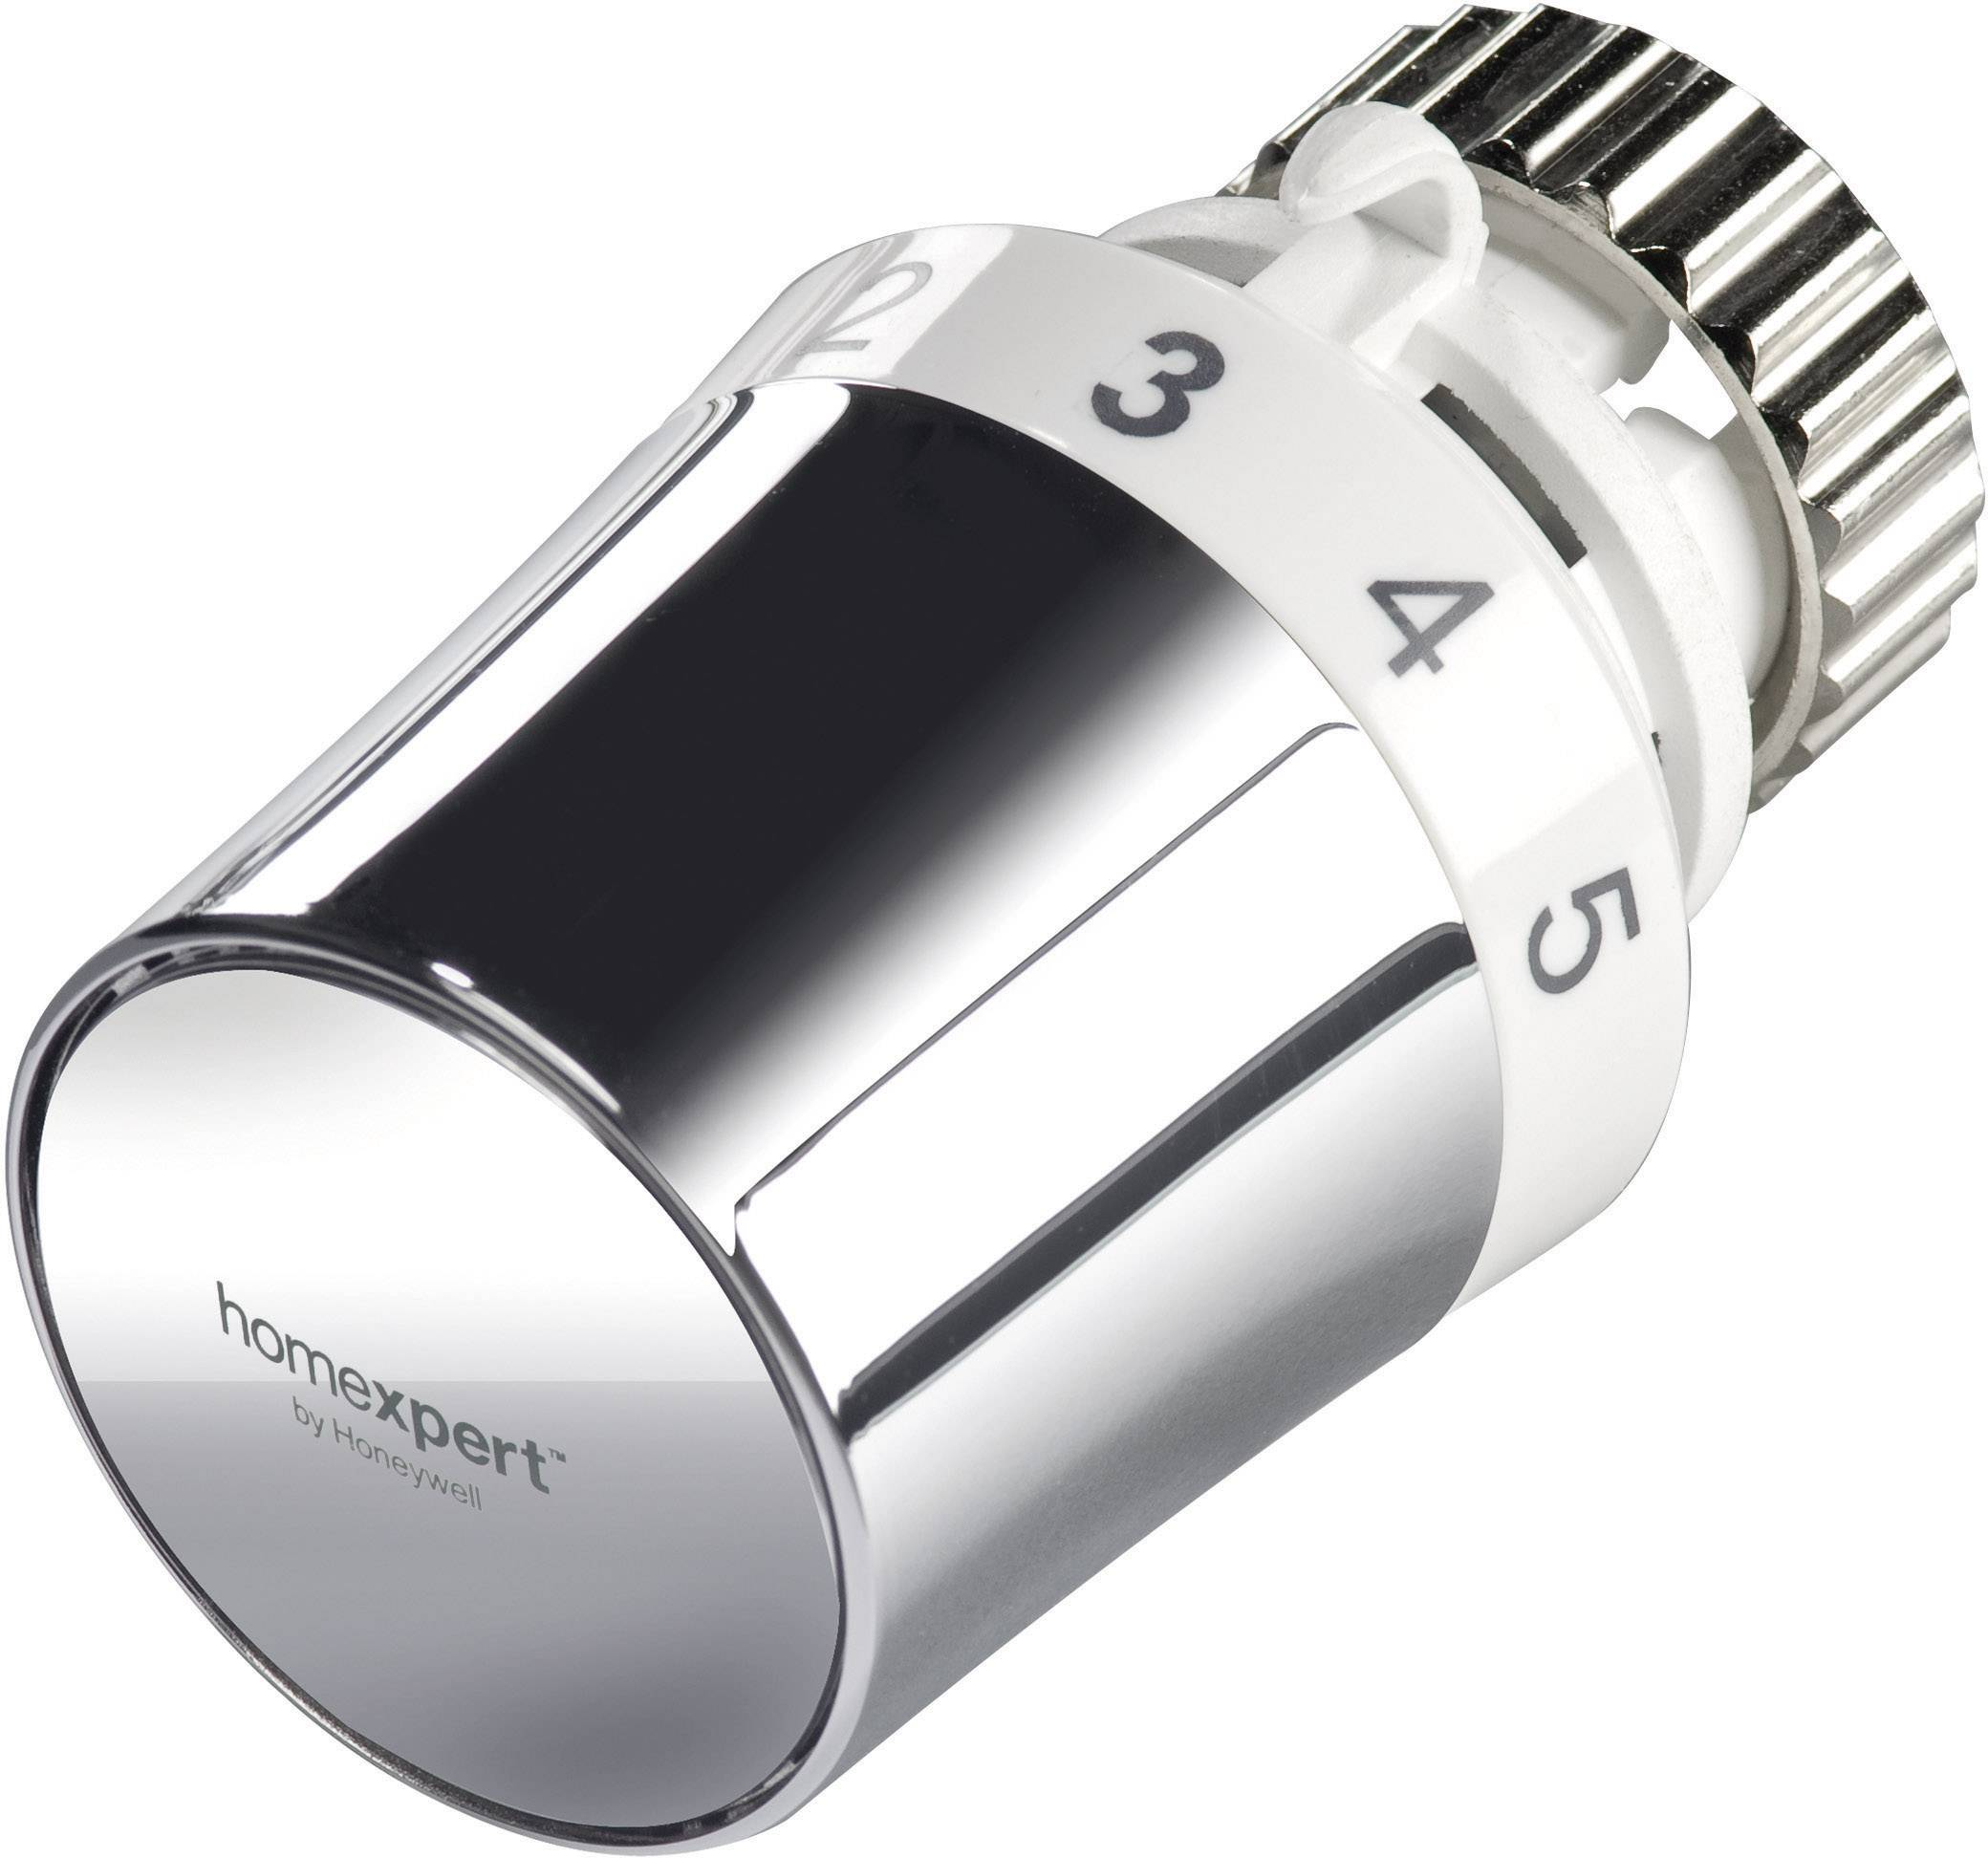 Termostatická hlavice Homexpert by Honeywell, M30 x 1.5, chrom (TRH7M30WGE)